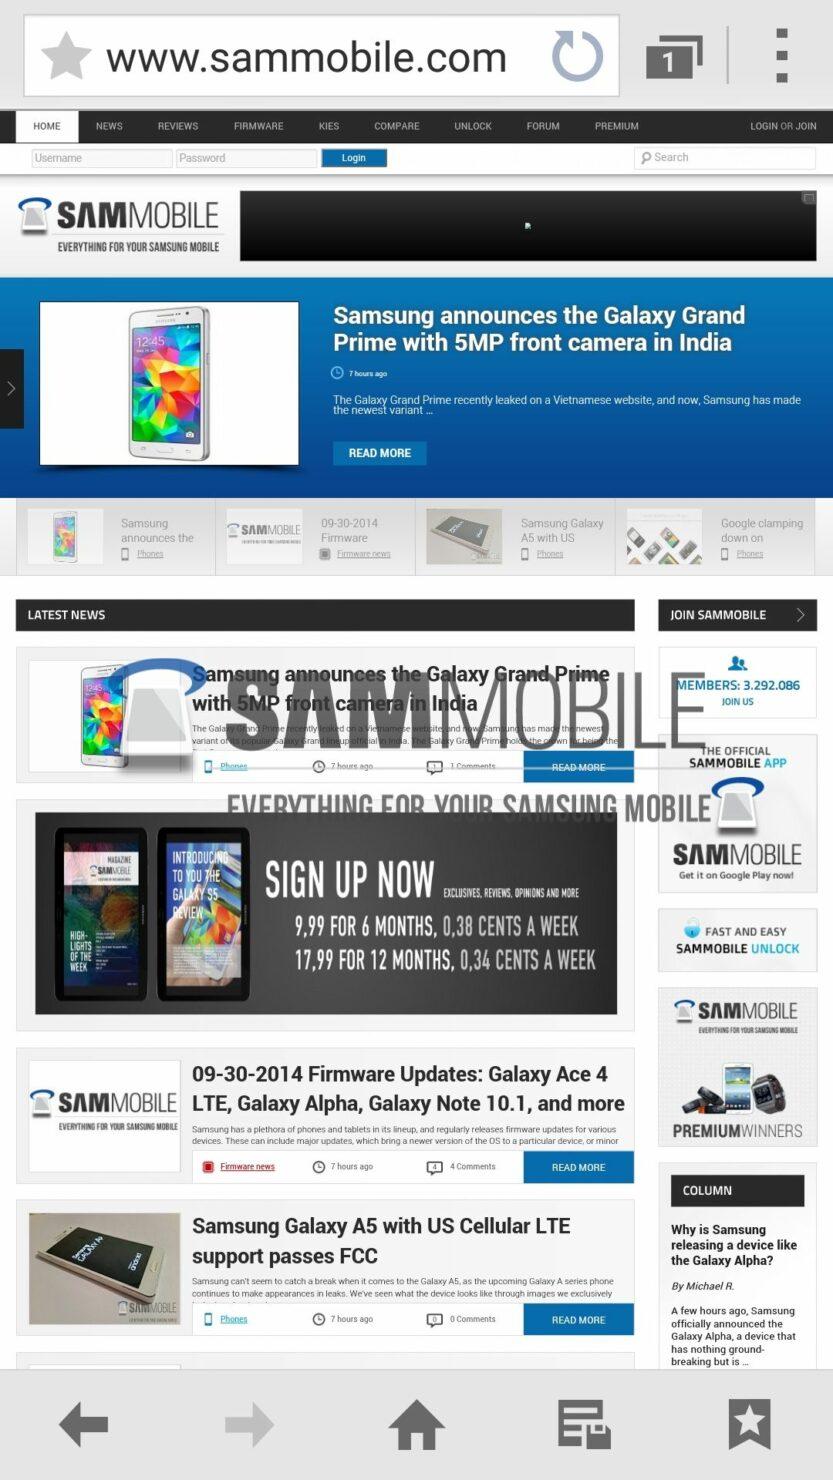 samsung-galaxy-s5-running-android-lollipop-8